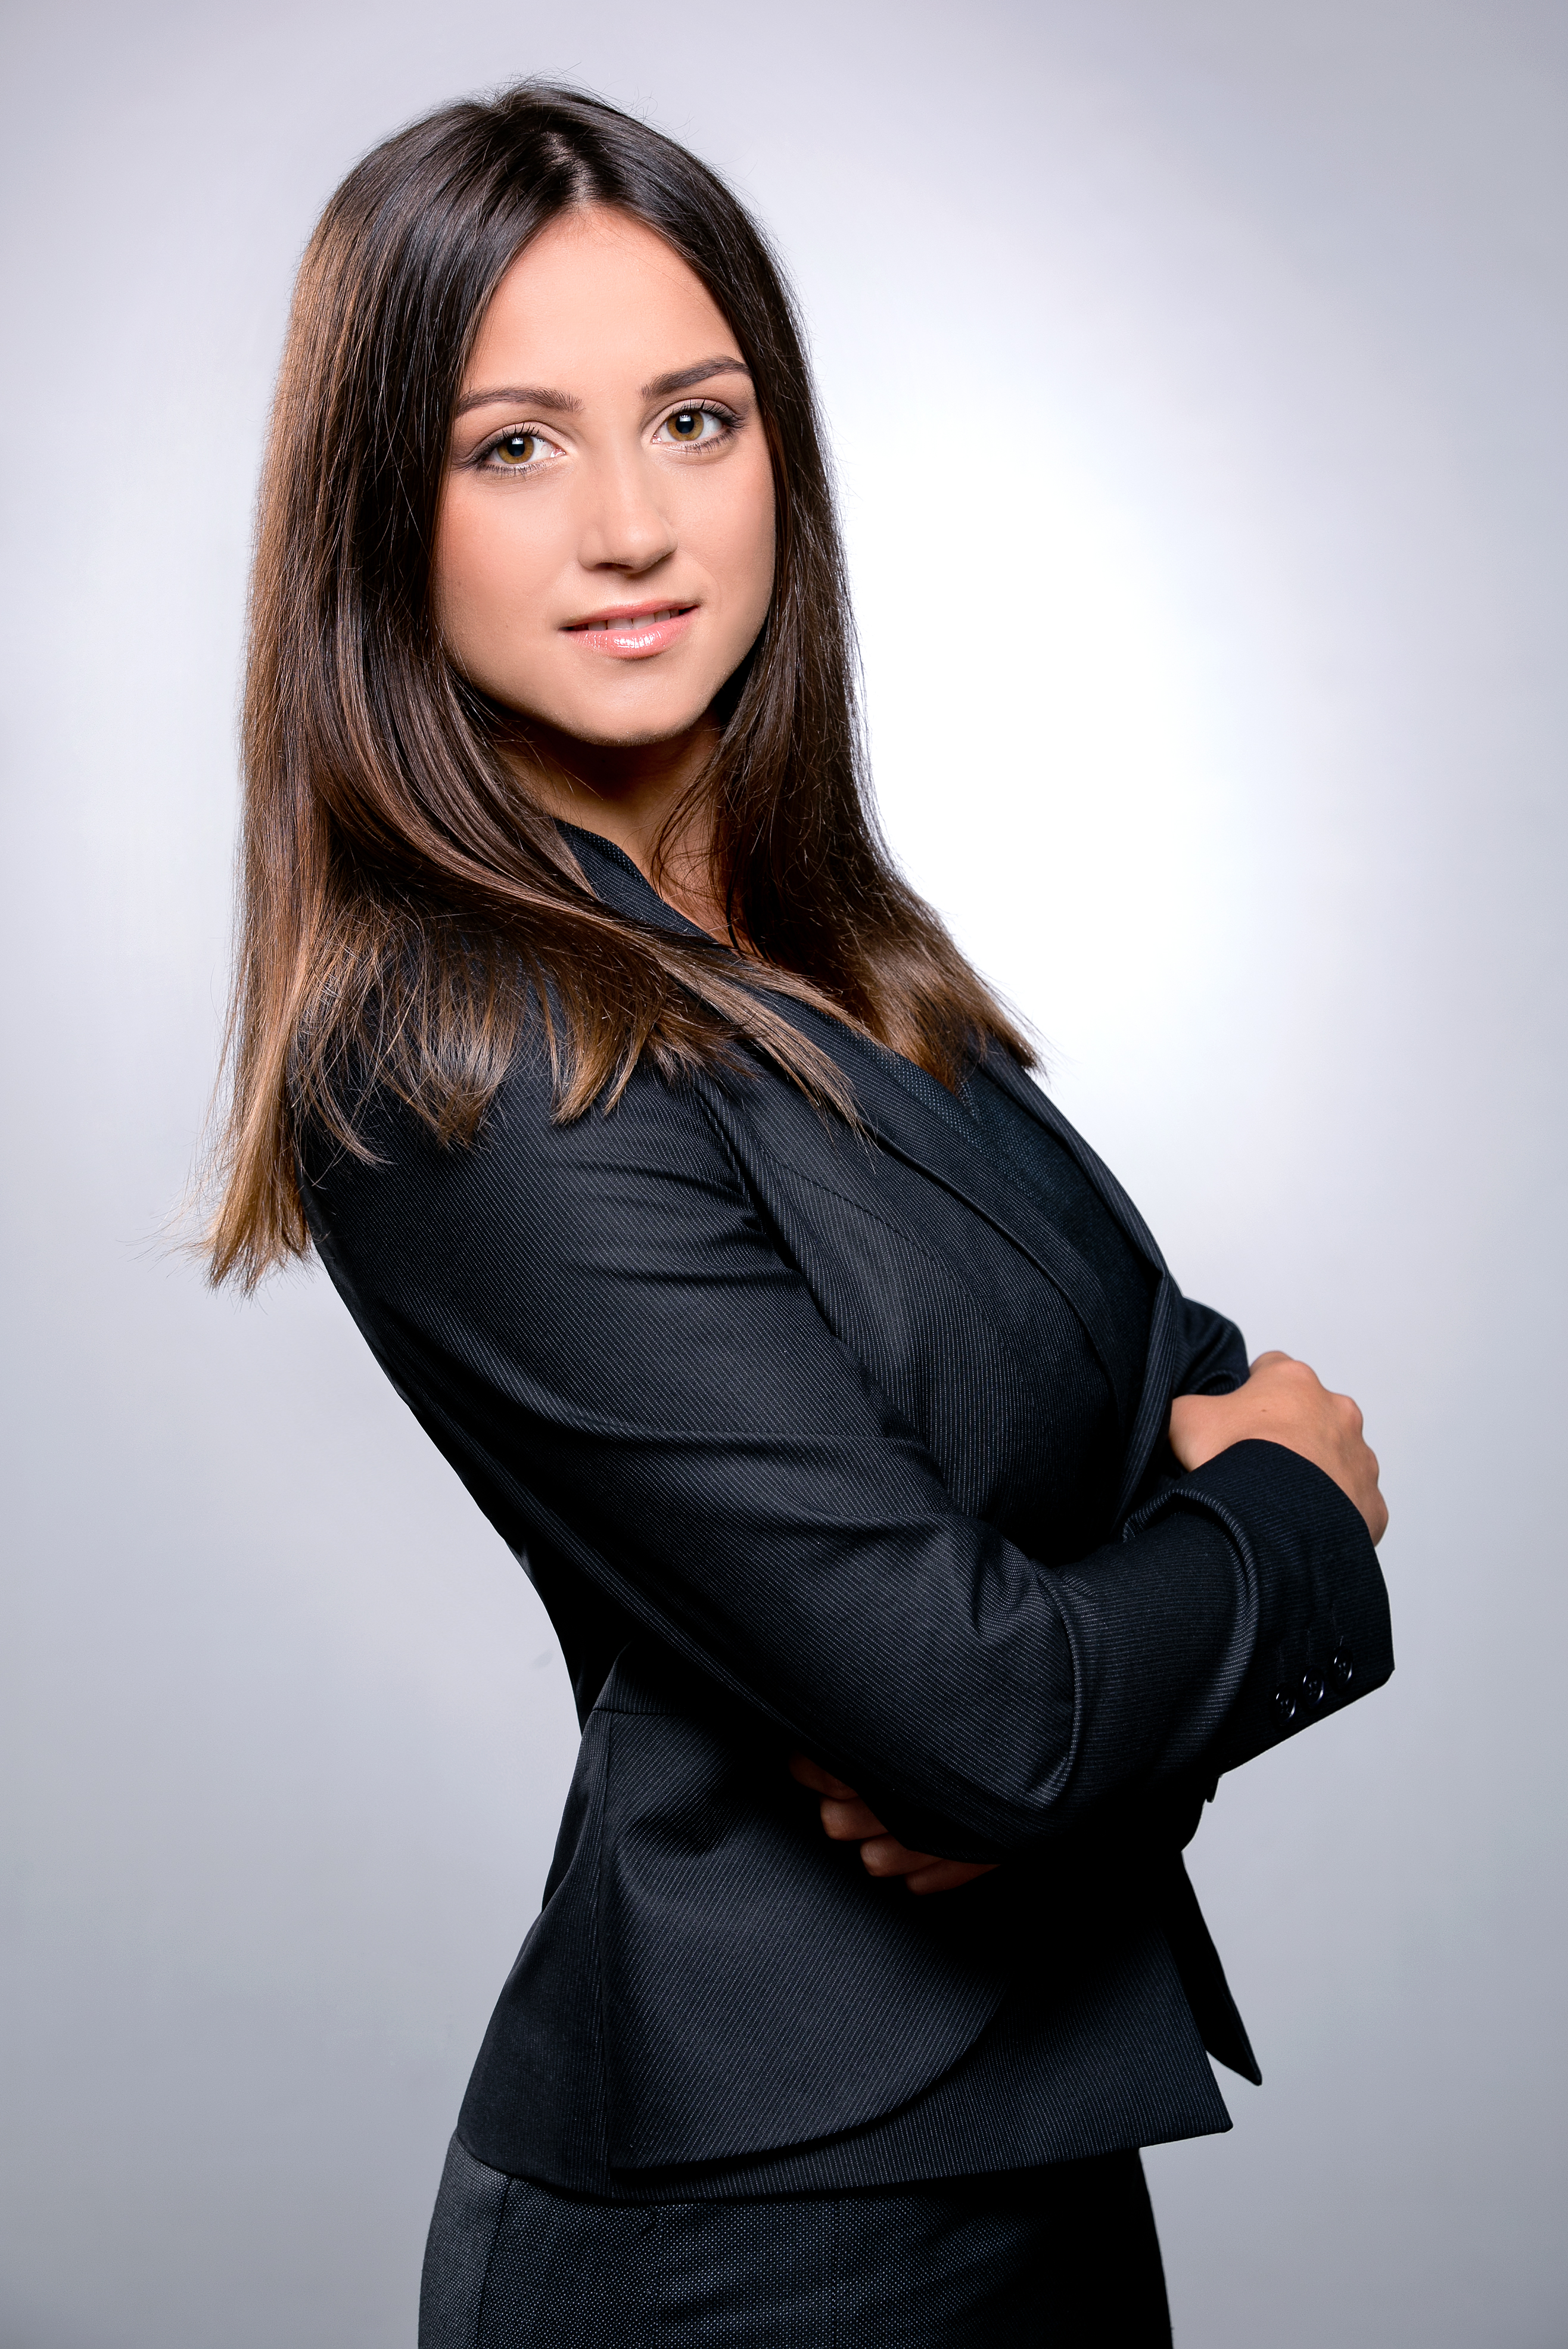 Margarita Ivanova